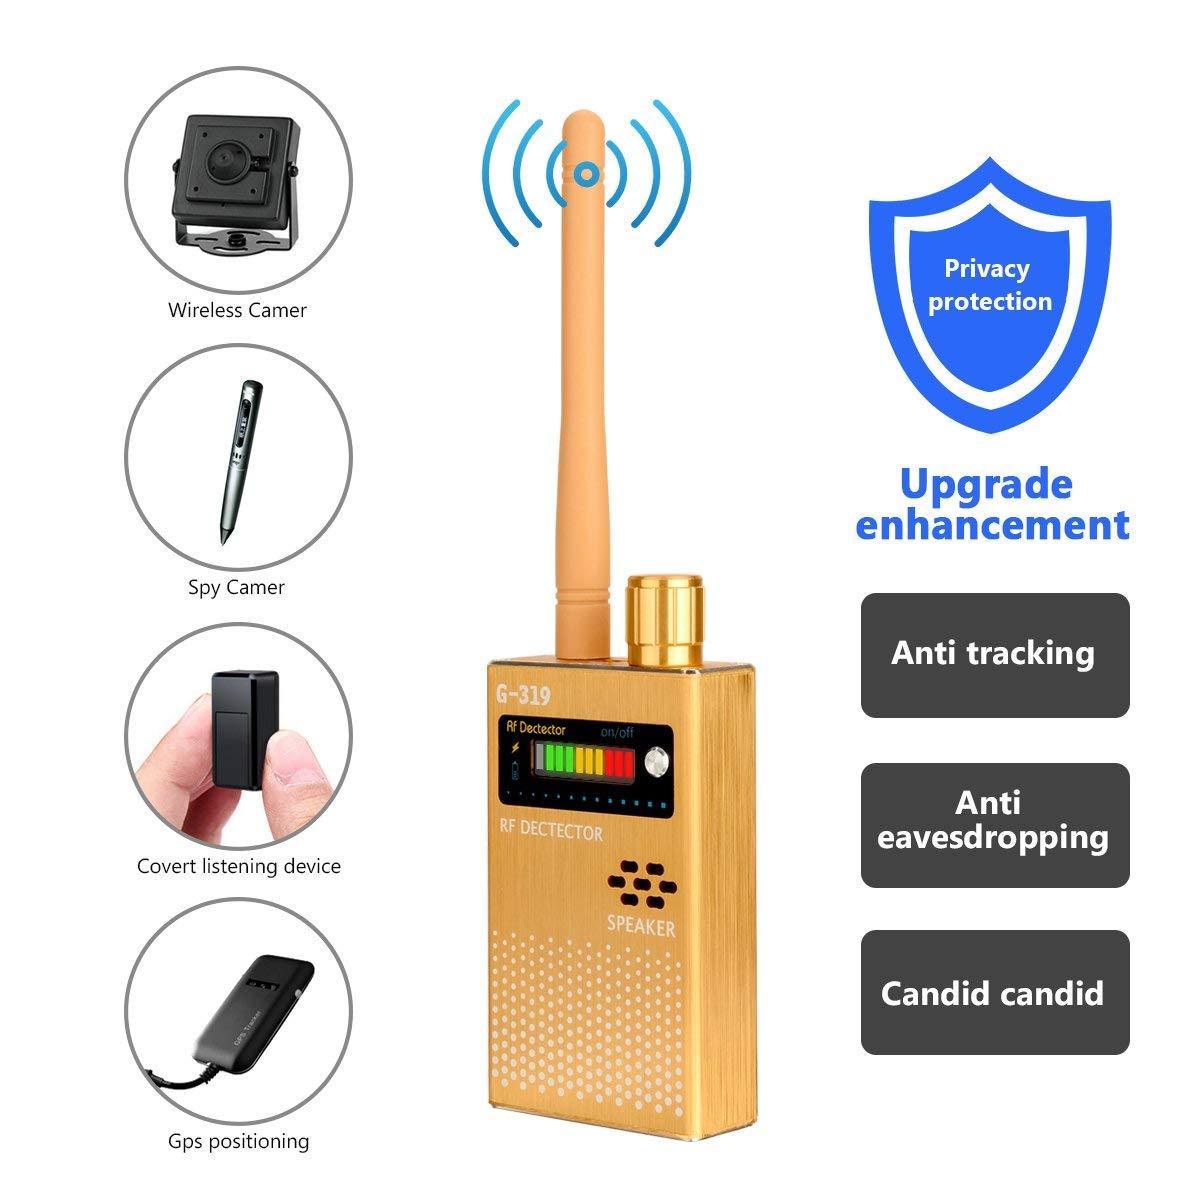 US $65 79 6% OFF|1MHz 8000MHz Radio Detection Anti Spy Signal Hidden Camera  GSM Audio Bug Finder 4G GPS Signals Lens RF Tracker Detectors Black-in